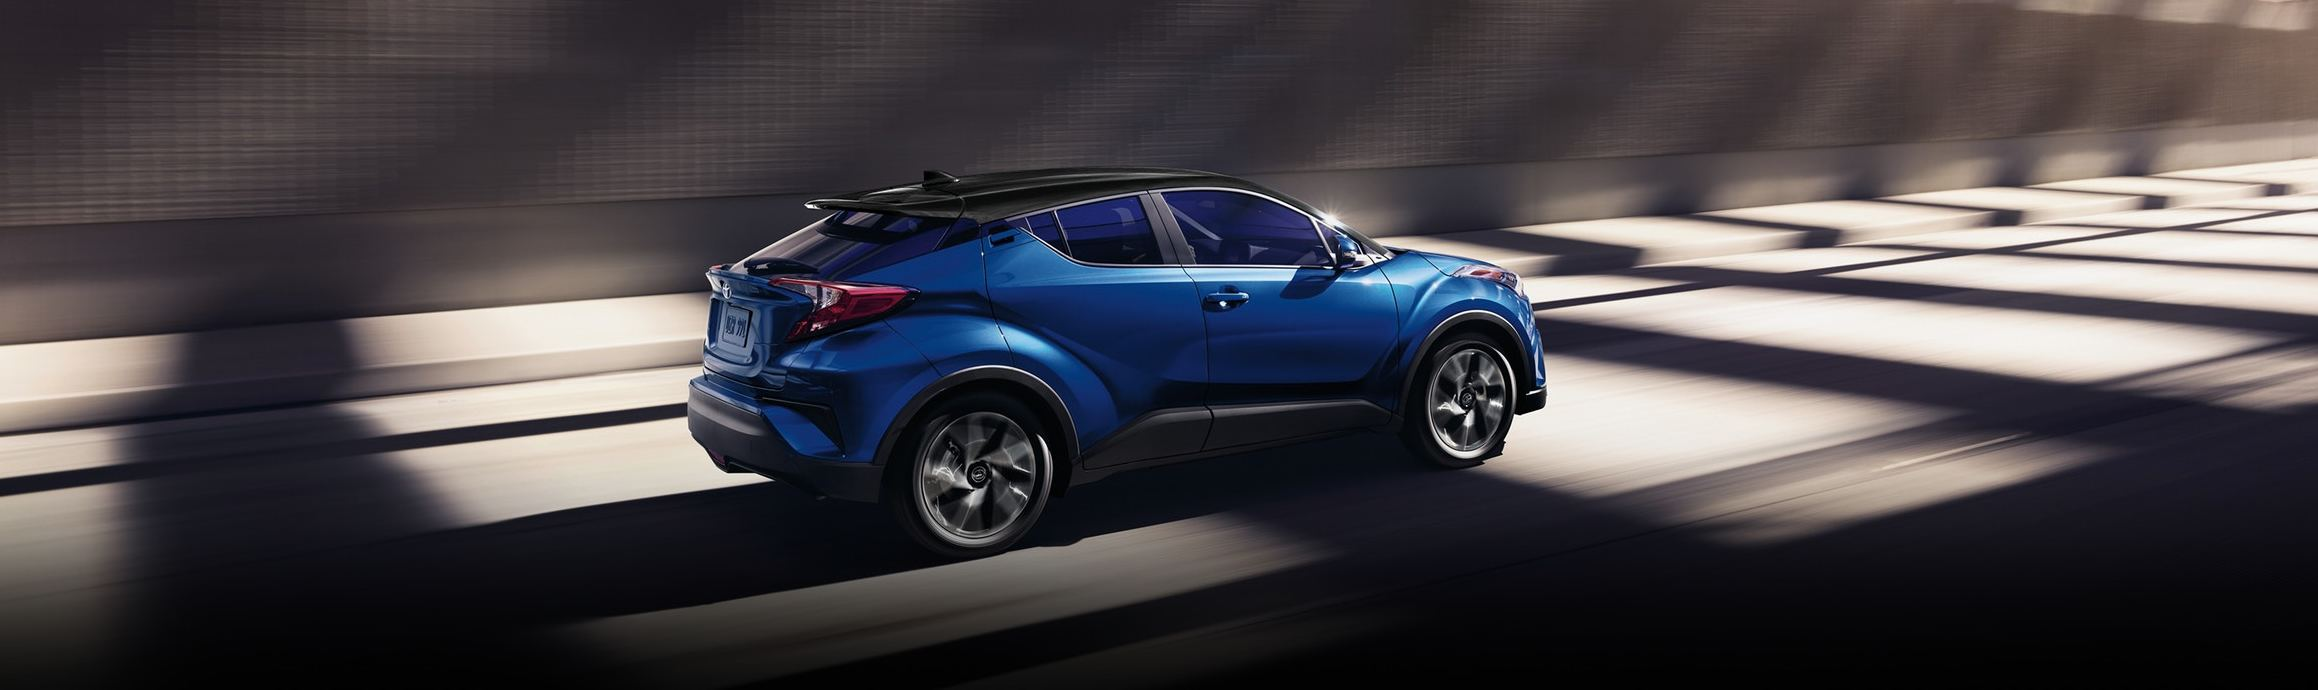 2020 Toyota C-HR for Sale near Bridgewater, NJ